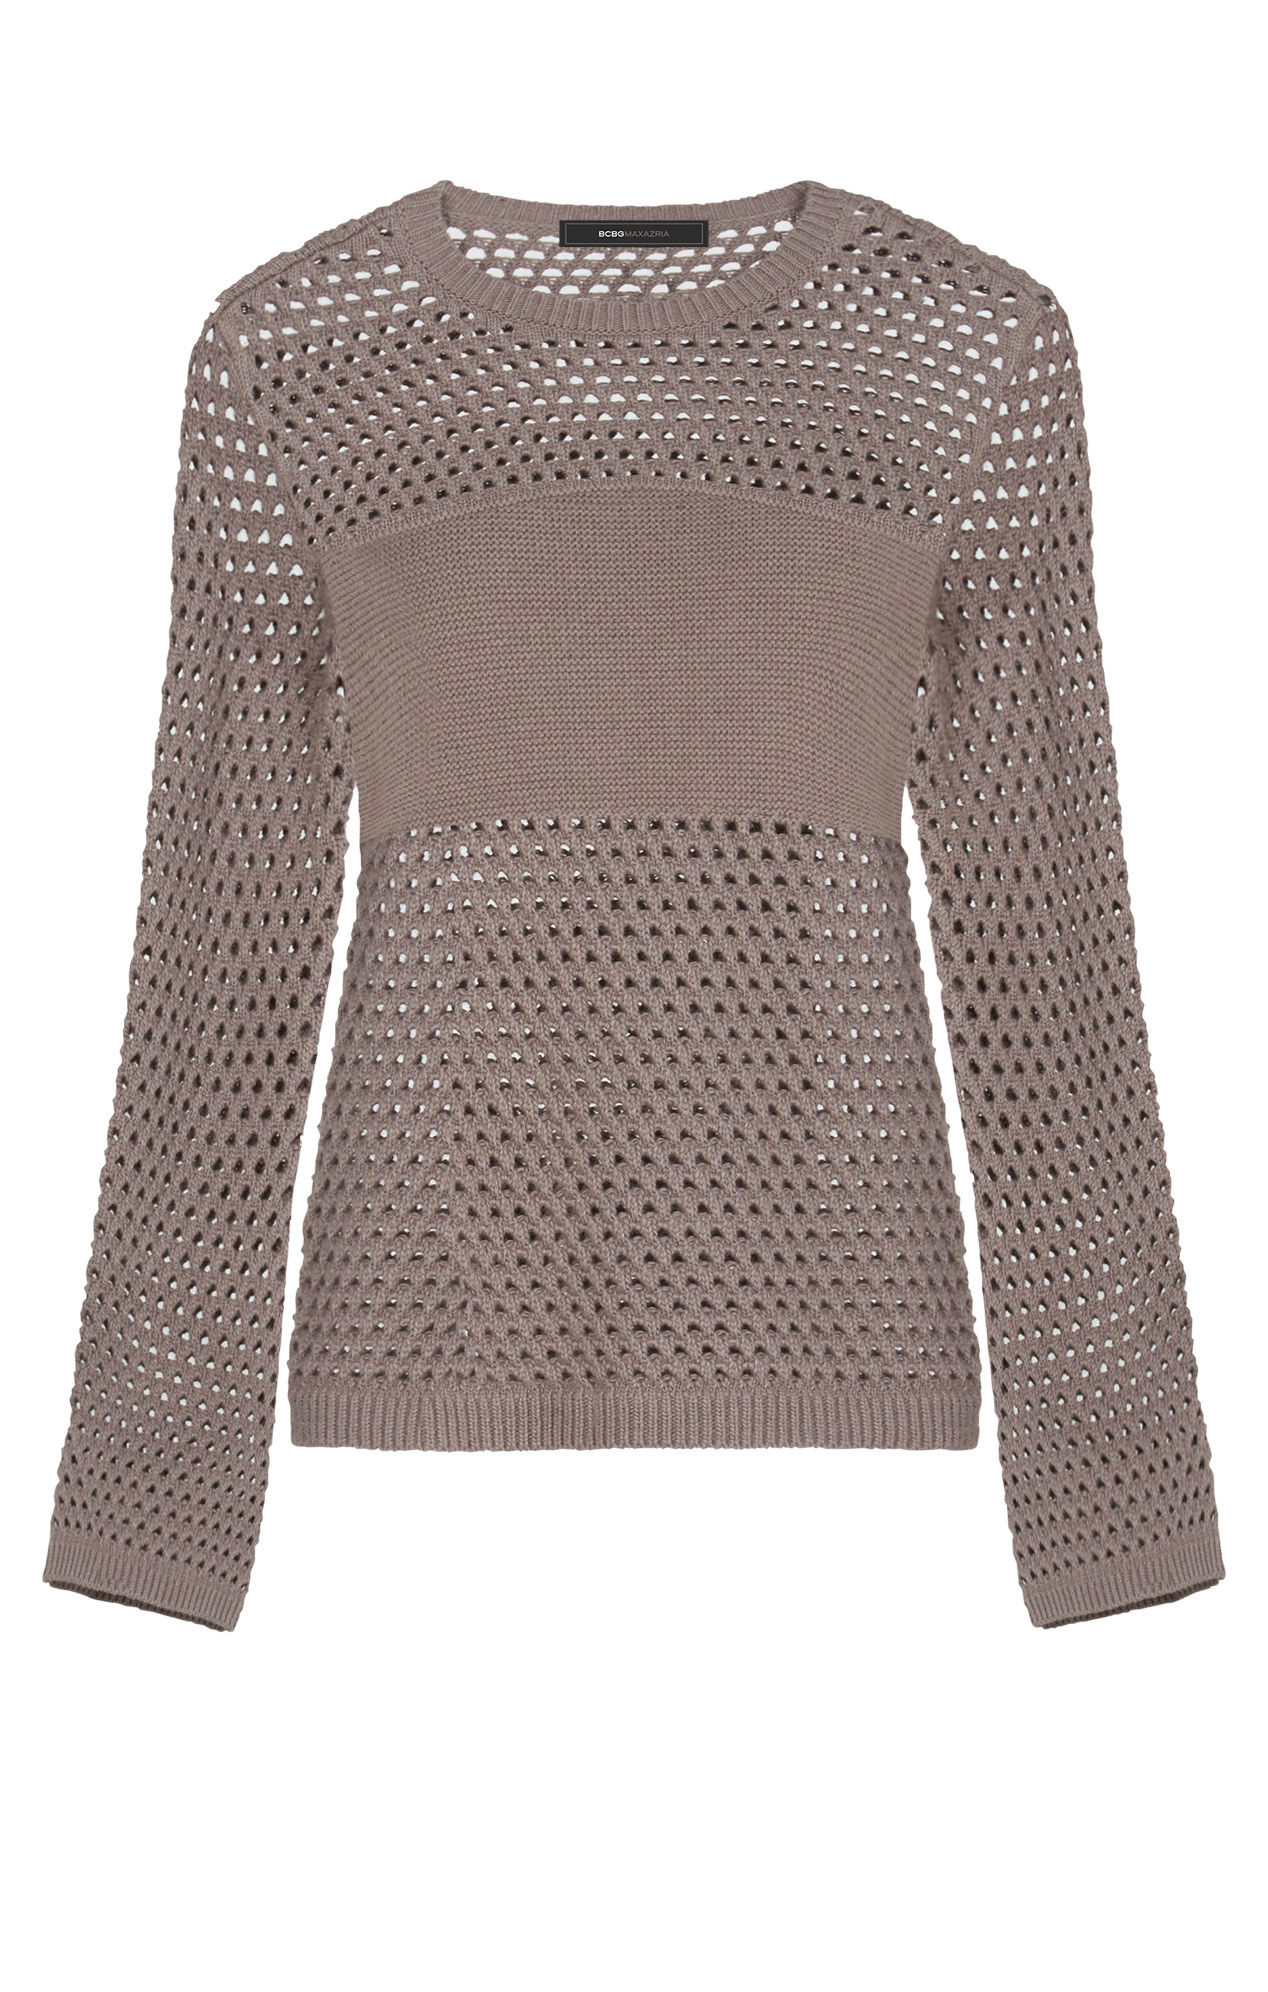 Bcbgmaxazria Joeli Mesh Pullover Sweater in Brown | Lyst